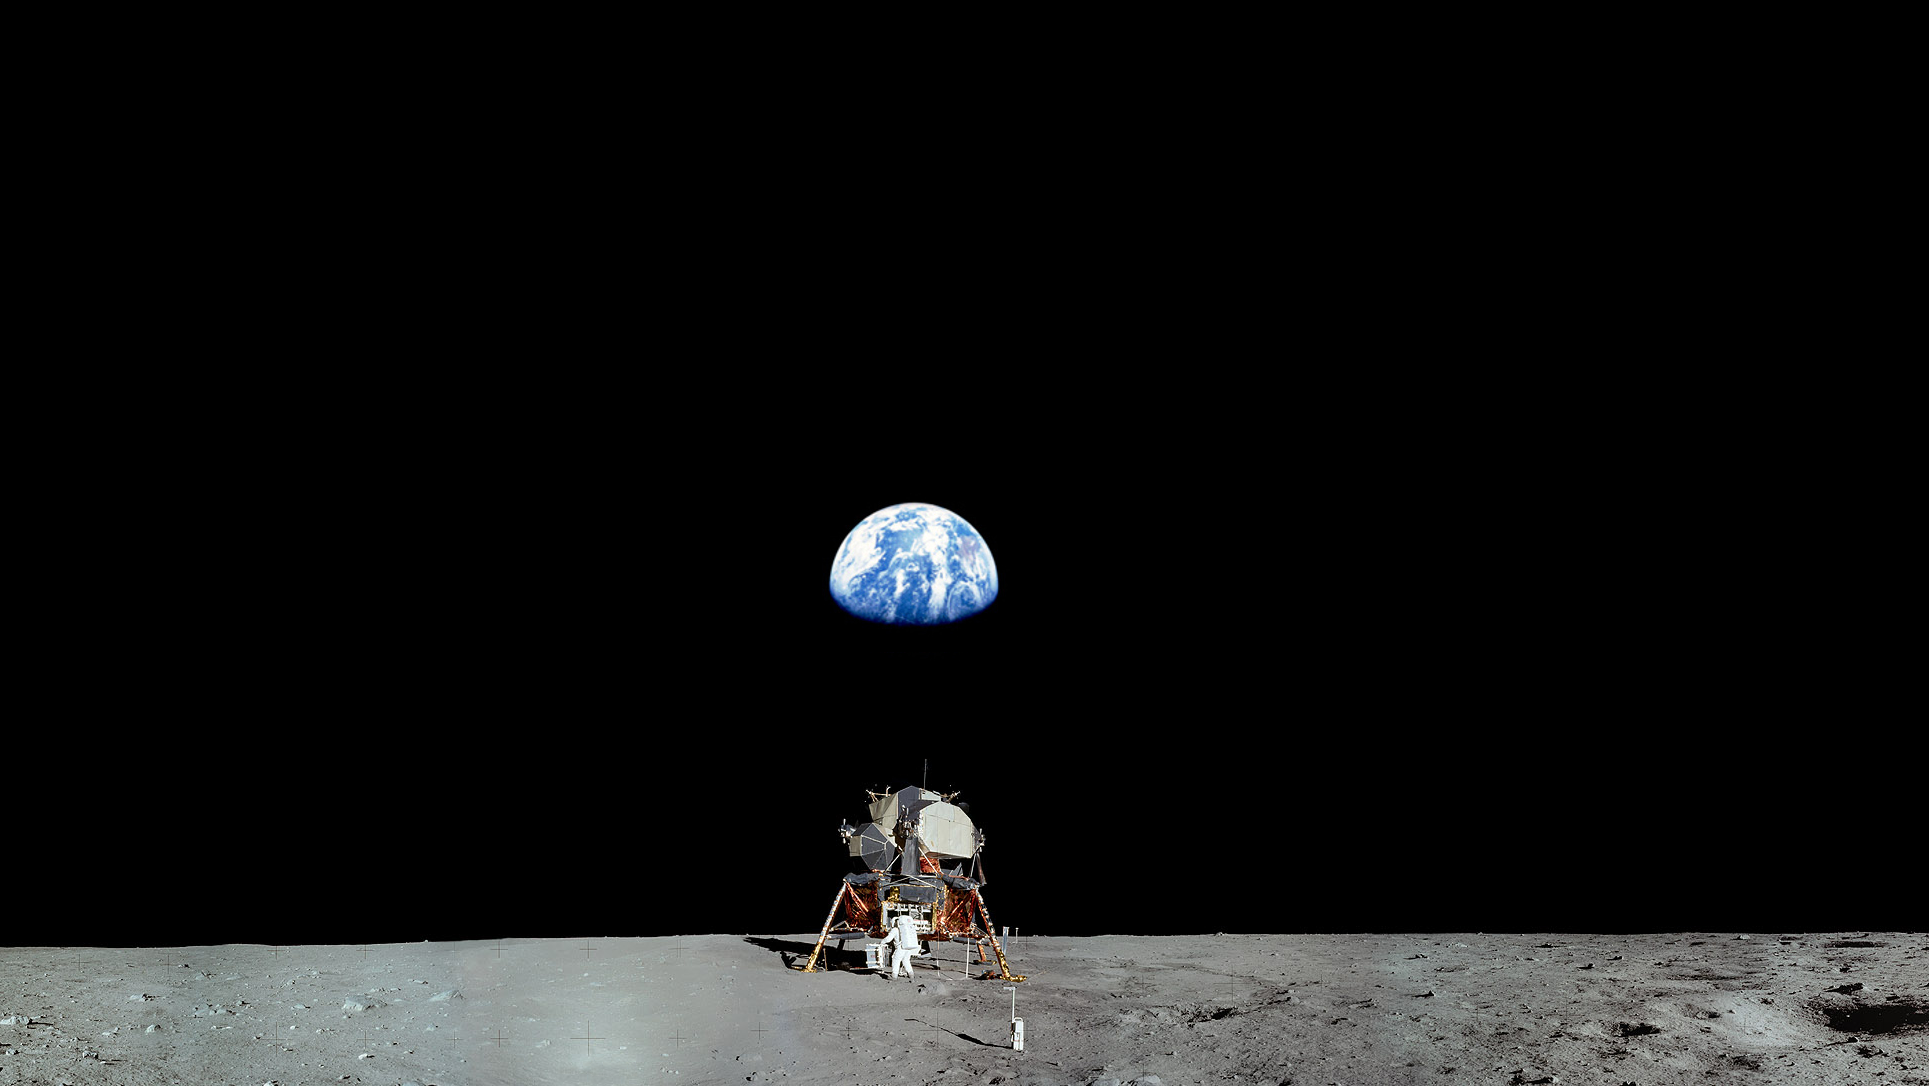 Earth from the Moon Wallpaper - WallpaperSafari